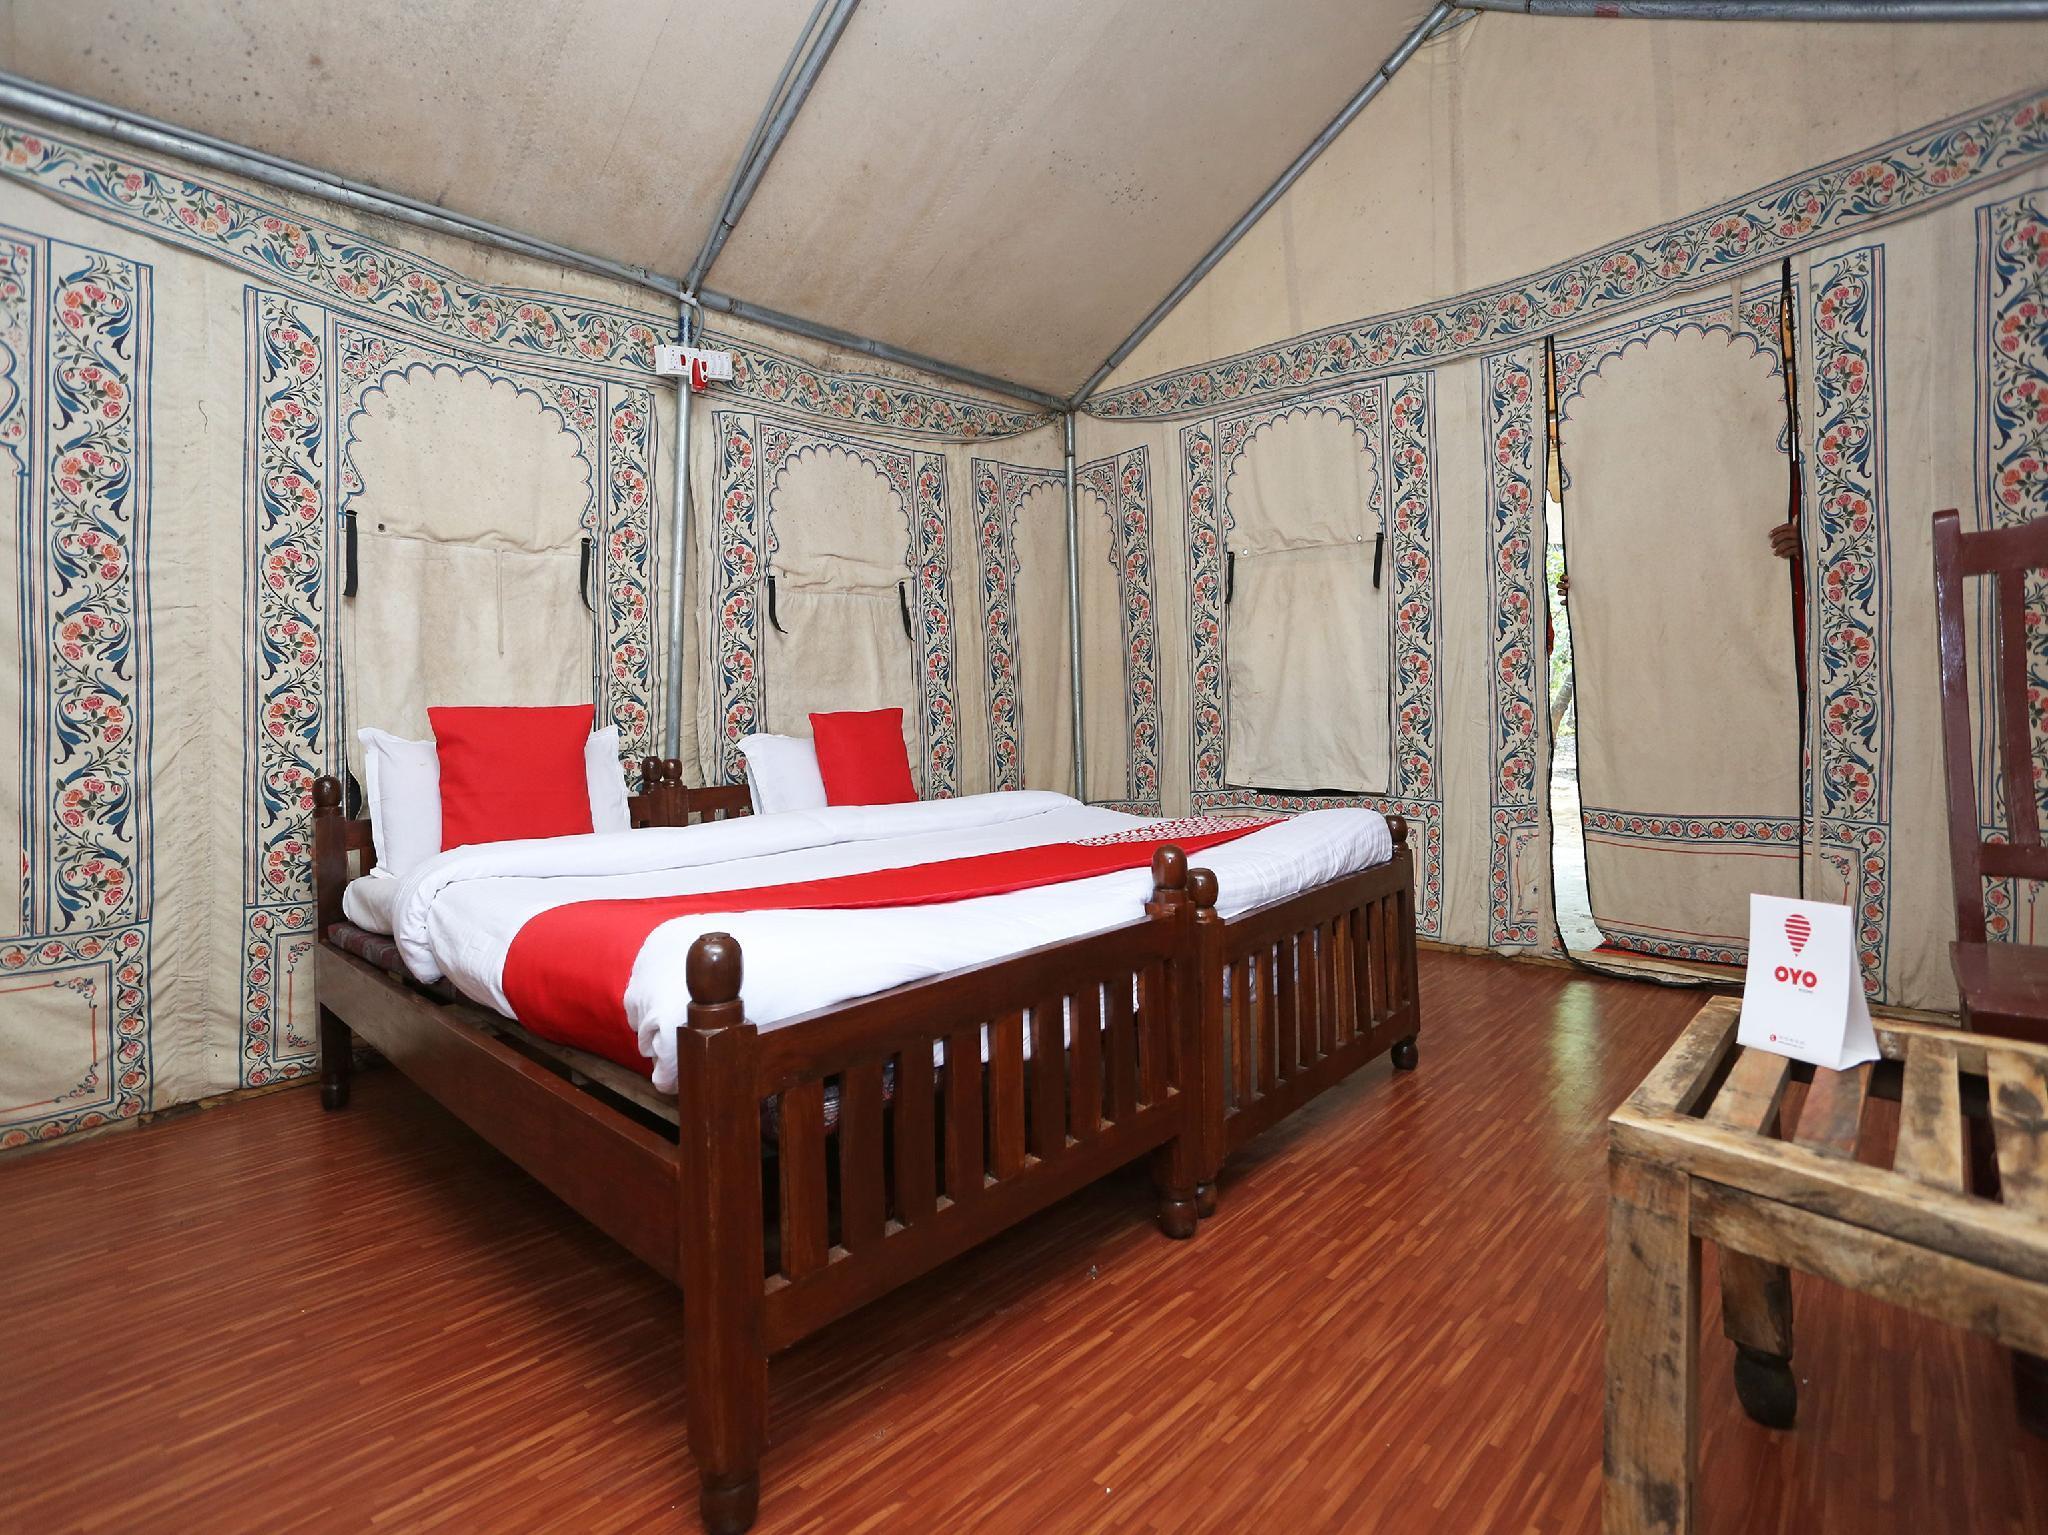 OYO 10981 Hotel Jungle Camp